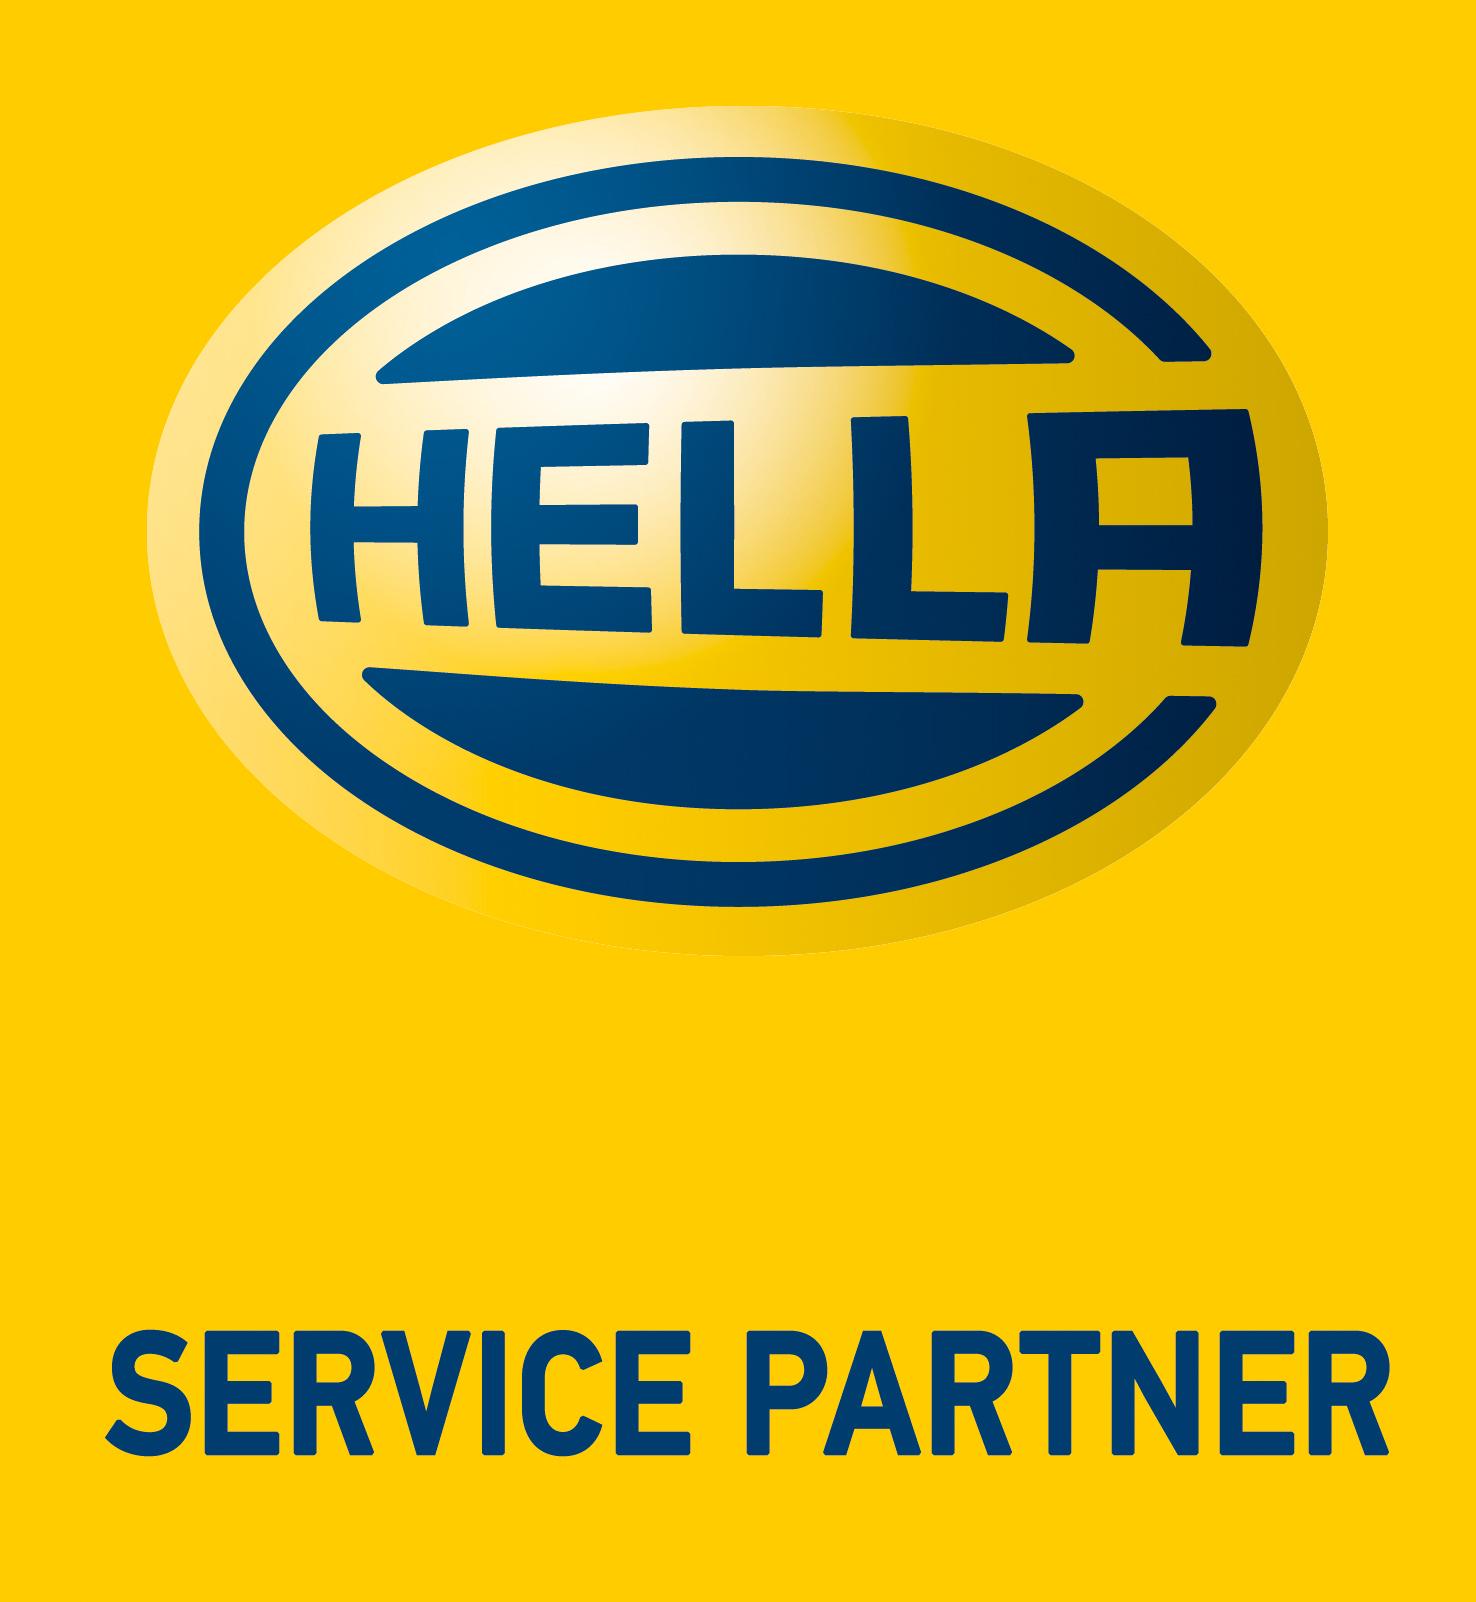 Ulstrup Autohandel - Hella Service Partner logo